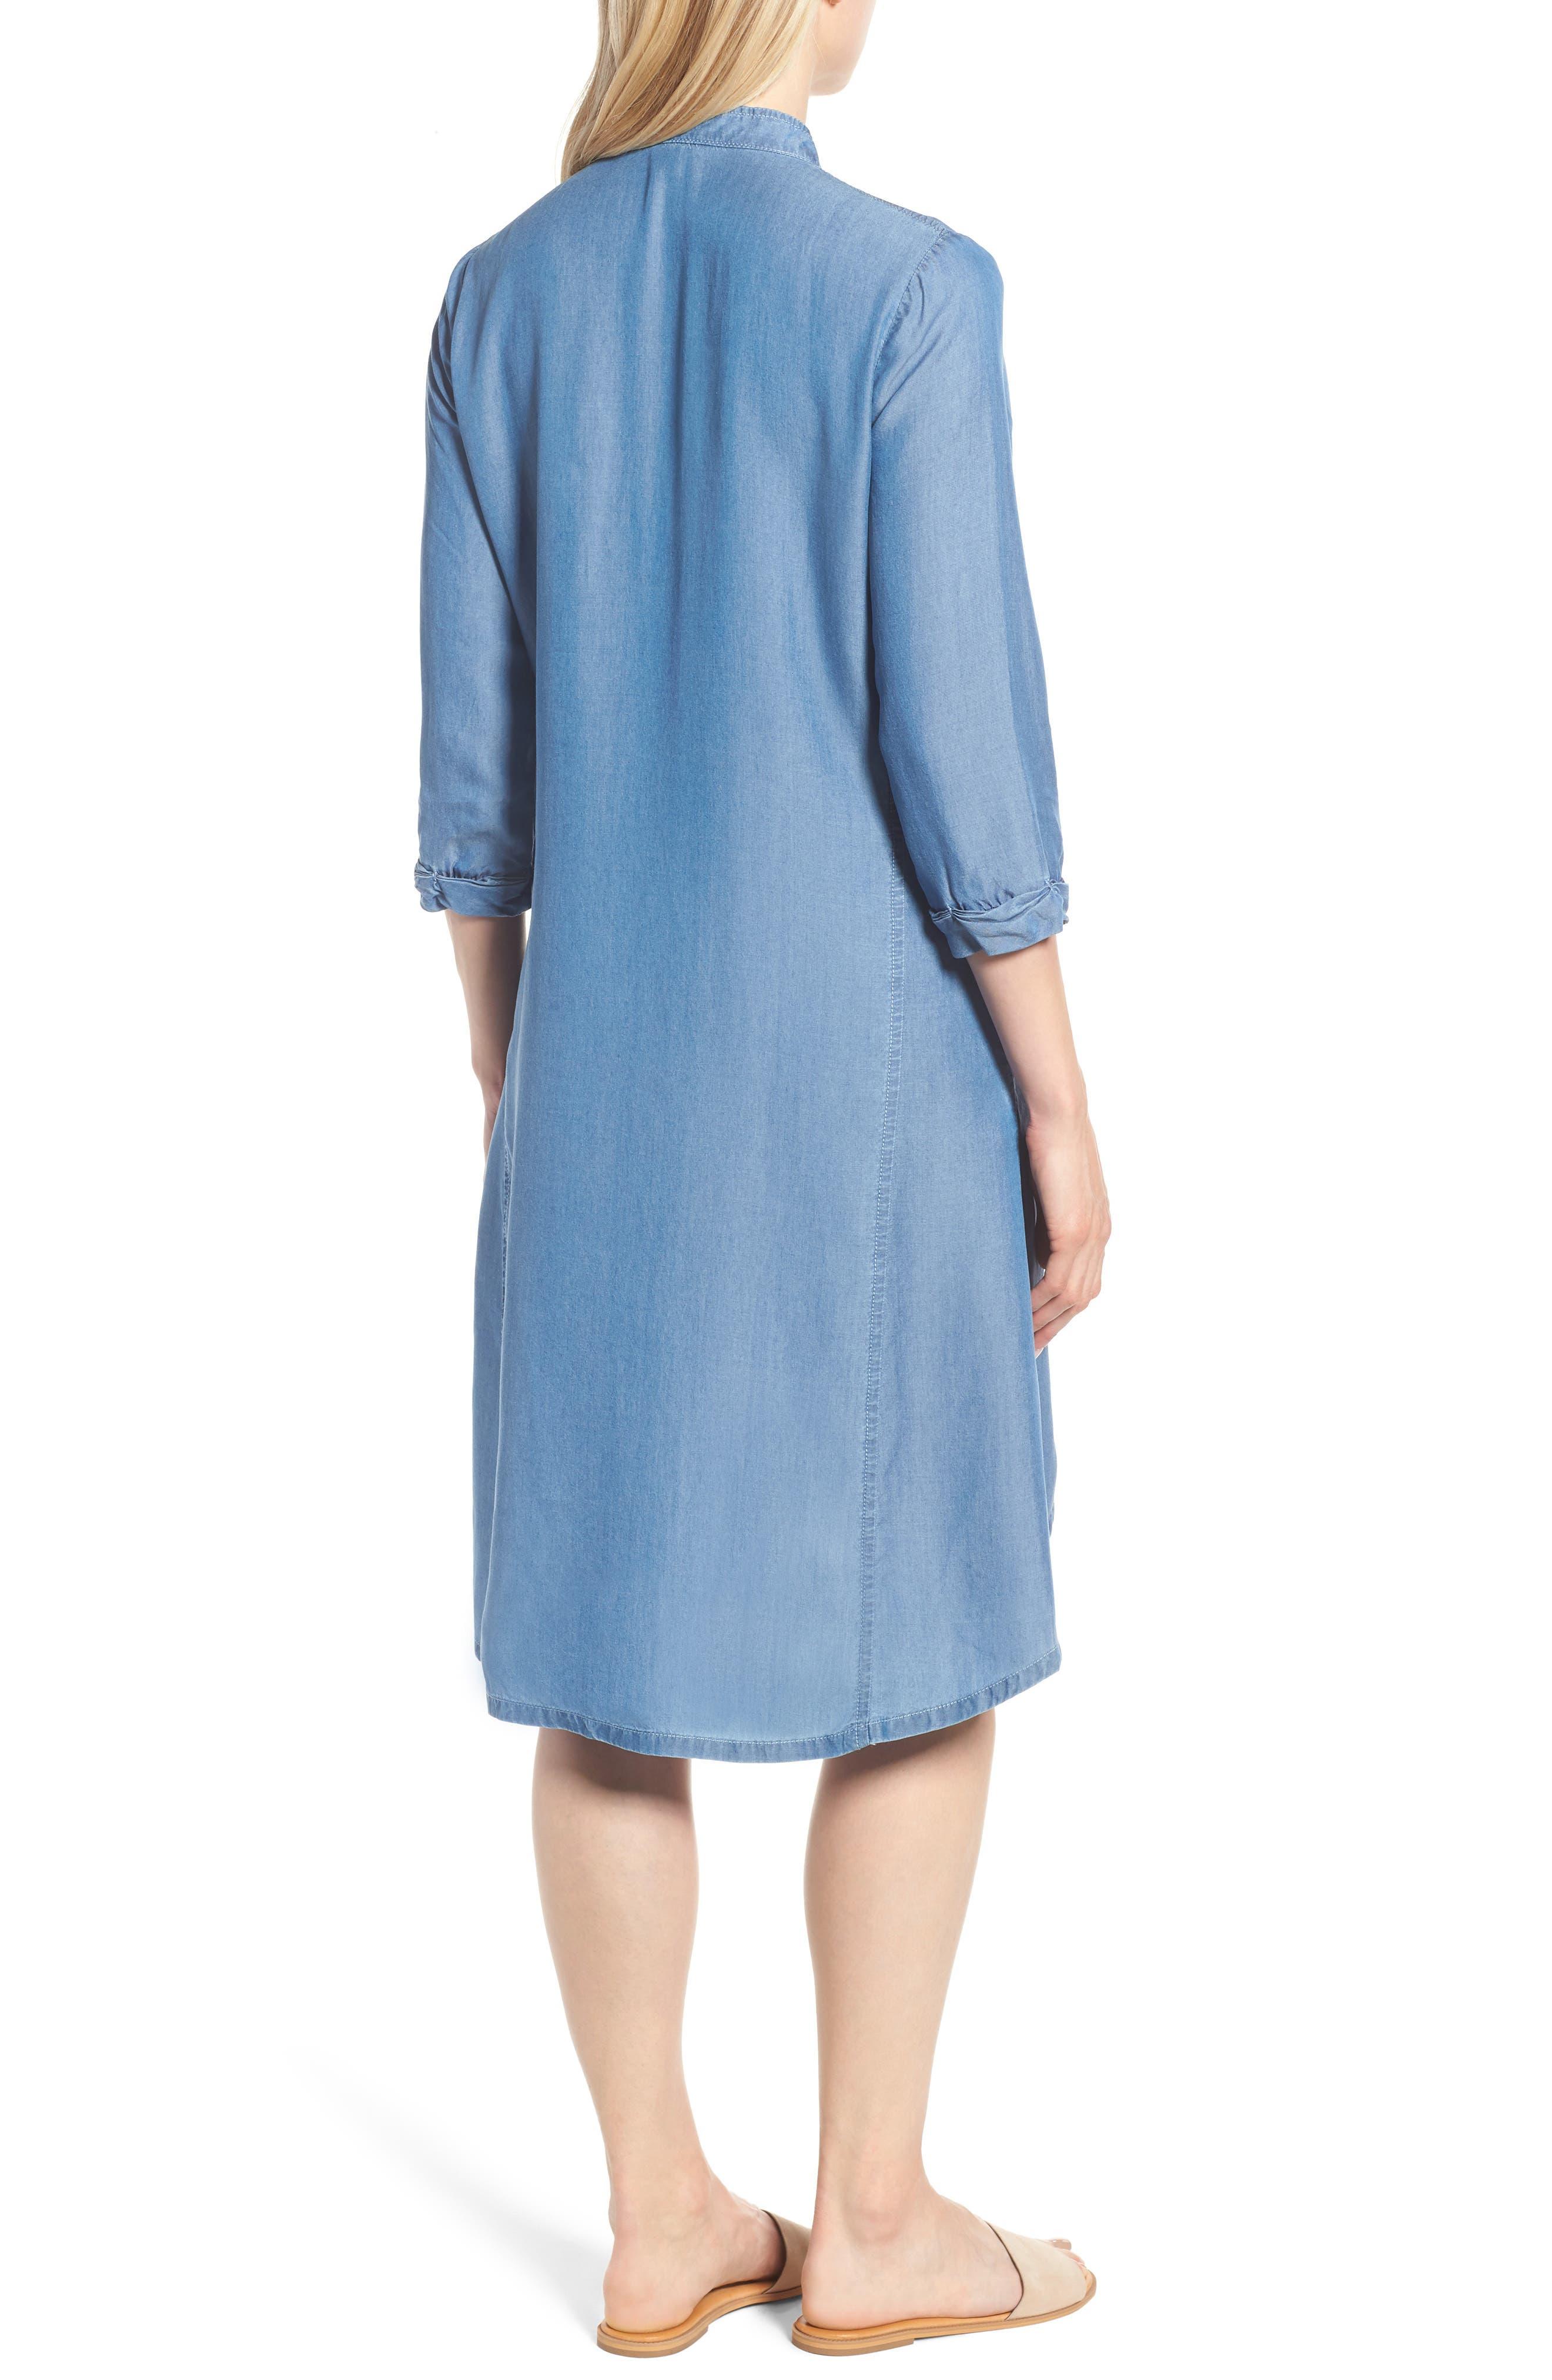 Festival Moonlit Tunic Dress,                             Alternate thumbnail 2, color,                             Blue Haze